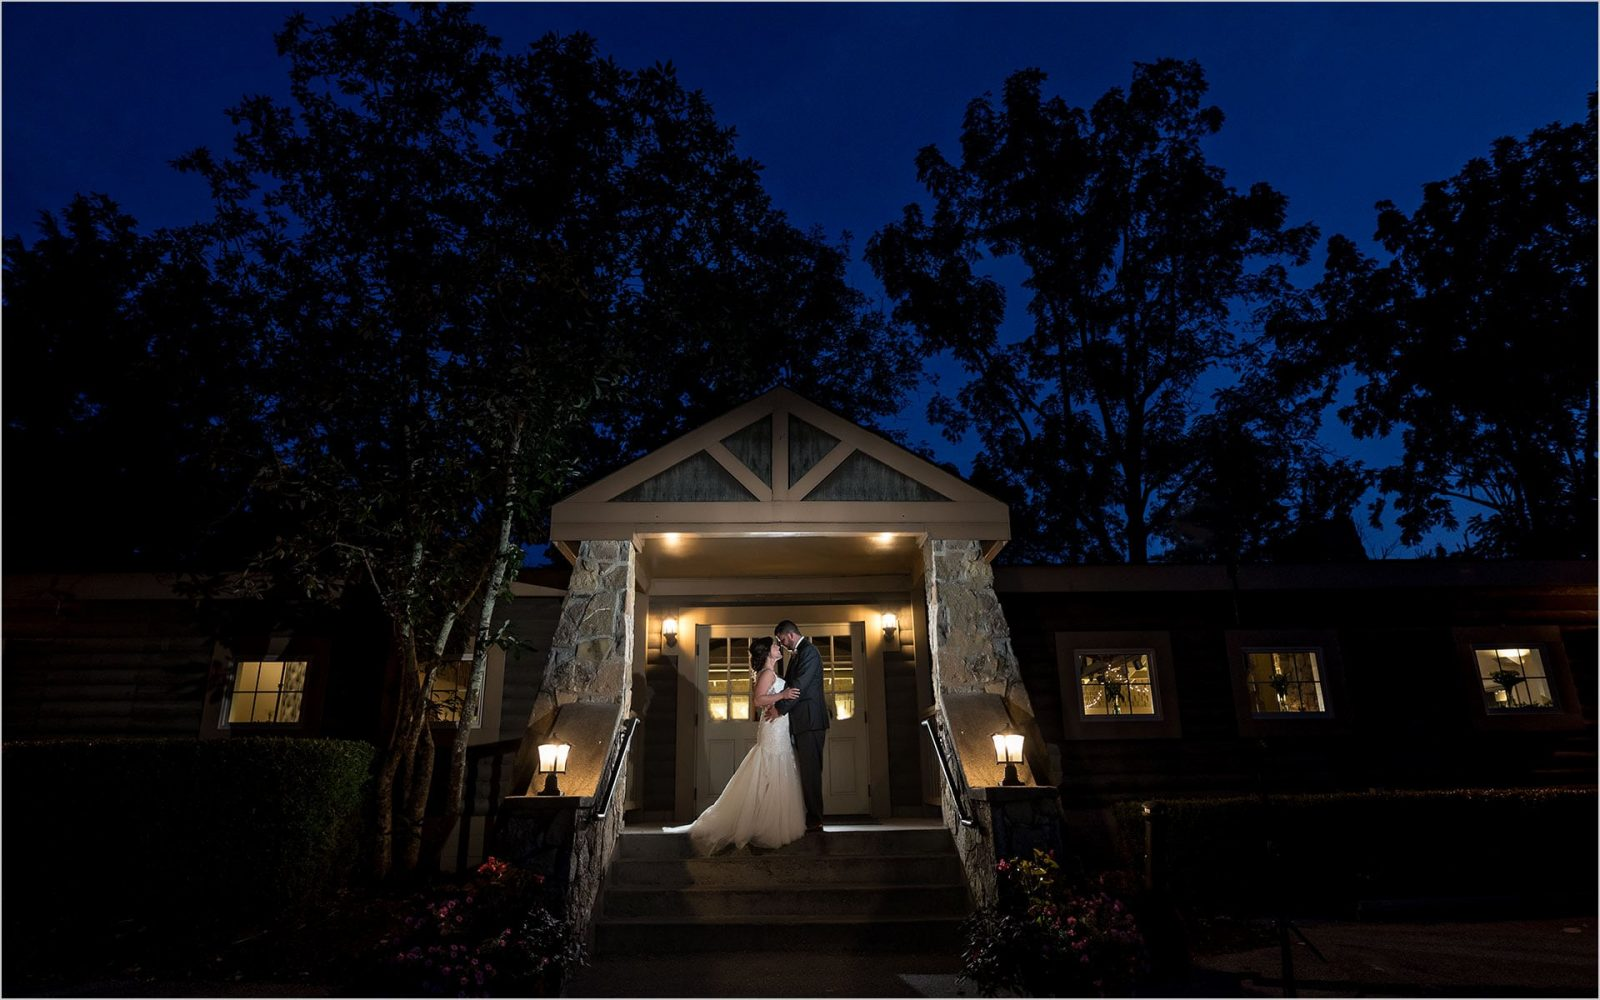 Pattison Park Lodge Wedding Reception night pictures